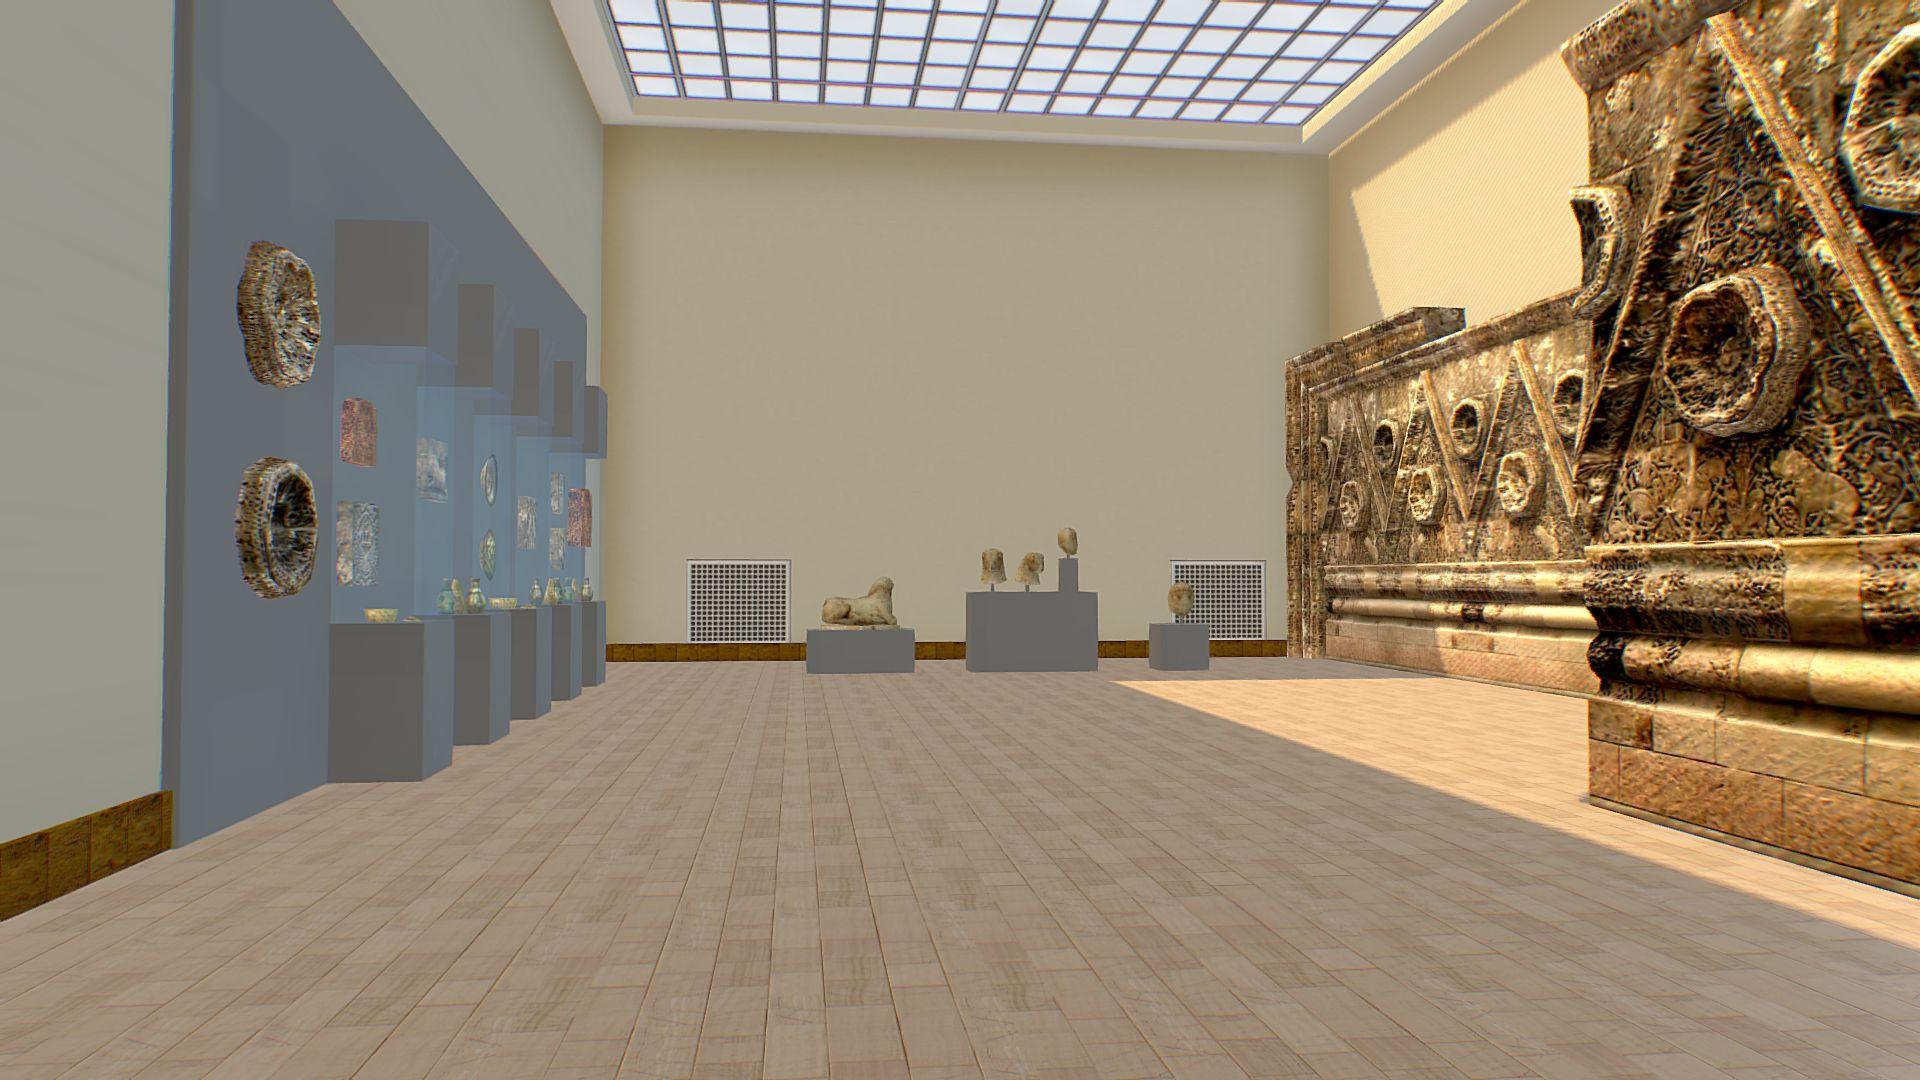 Pergamon Museum Babylon Mesopotamia Ishtar Gate With Images Pergamon Museum Pergamon Mesopotamia